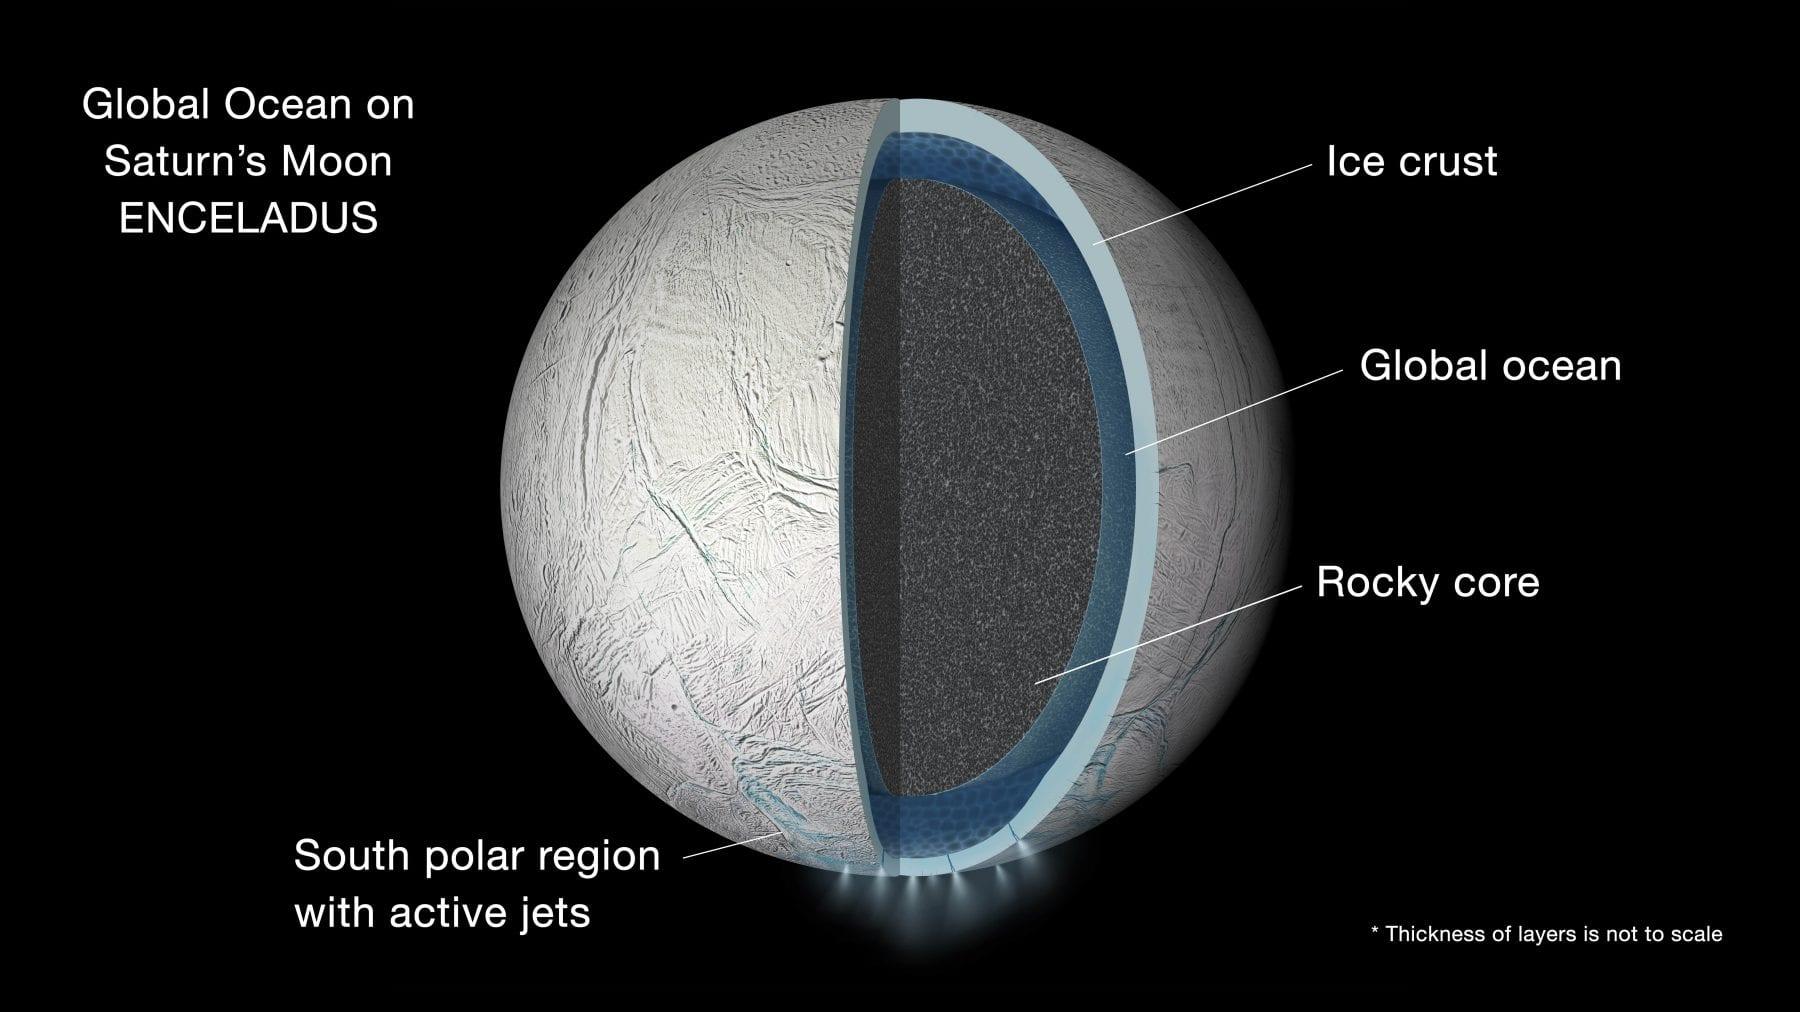 Illustration of Enceladus's interior and its underground oceans. Credit: NASA/JPL-Caltech